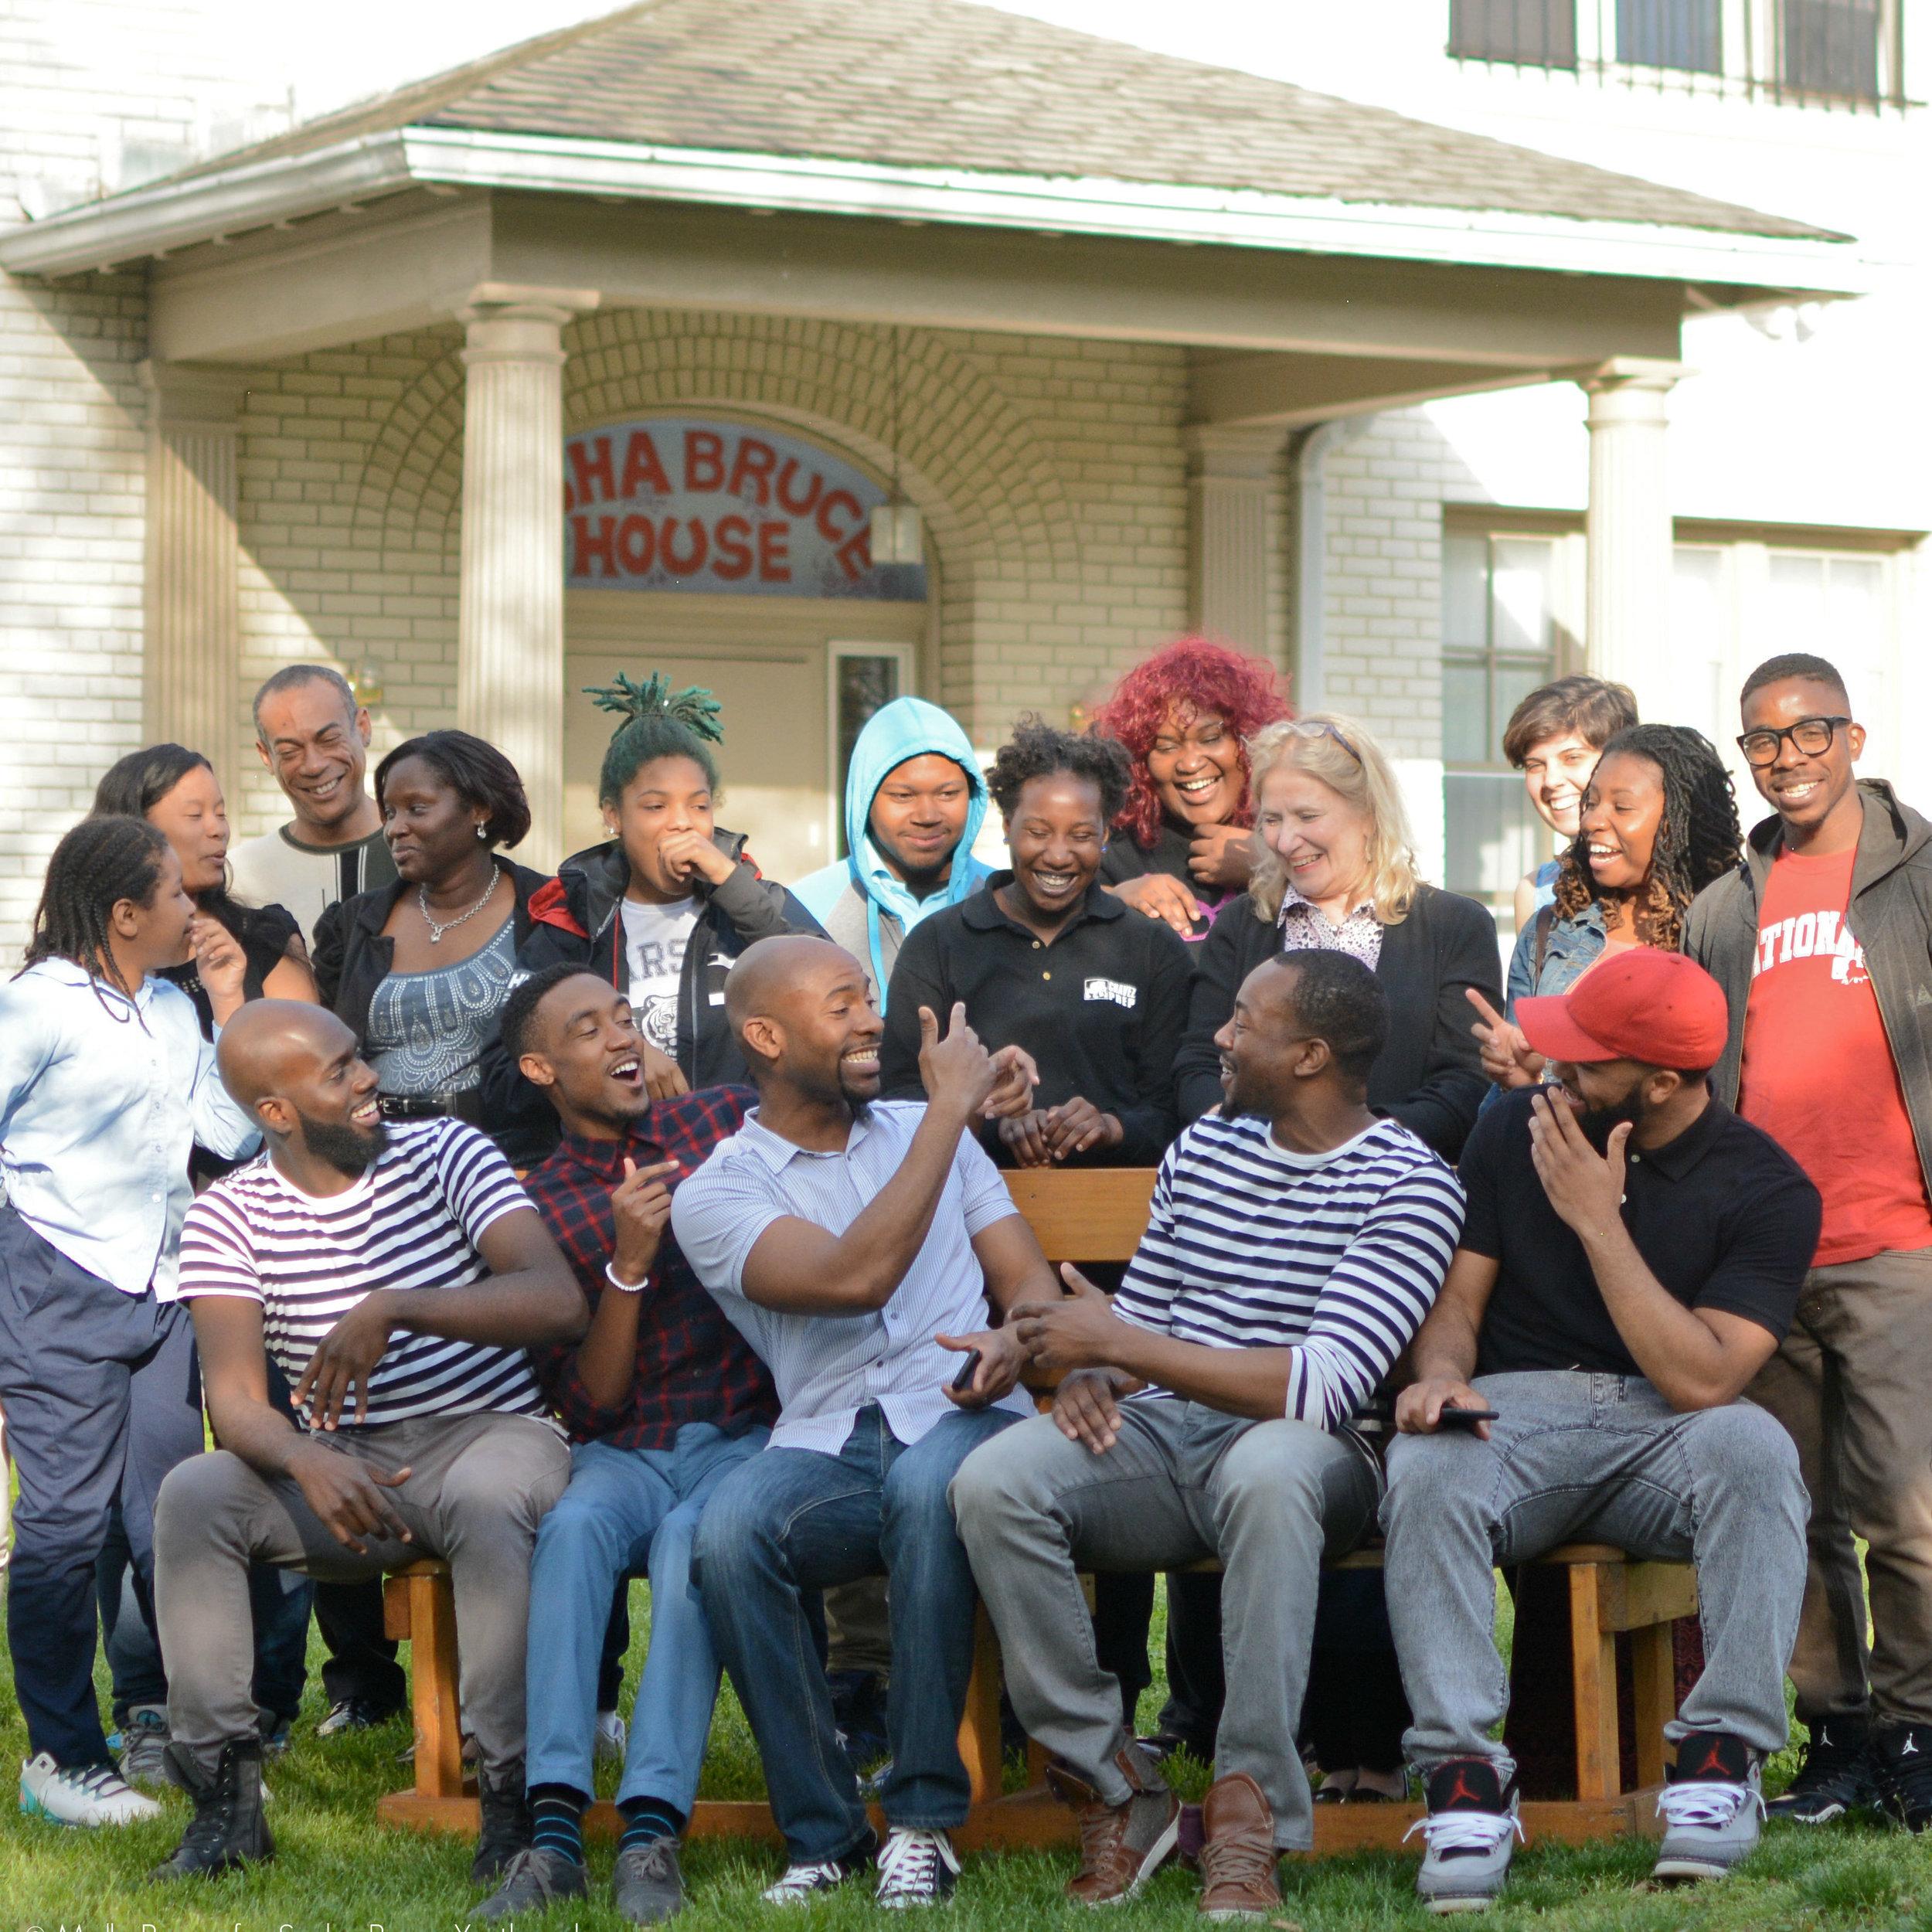 - Sasha Bruce staff and clients at its emergency youth shelter, the Sasha Bruce House.